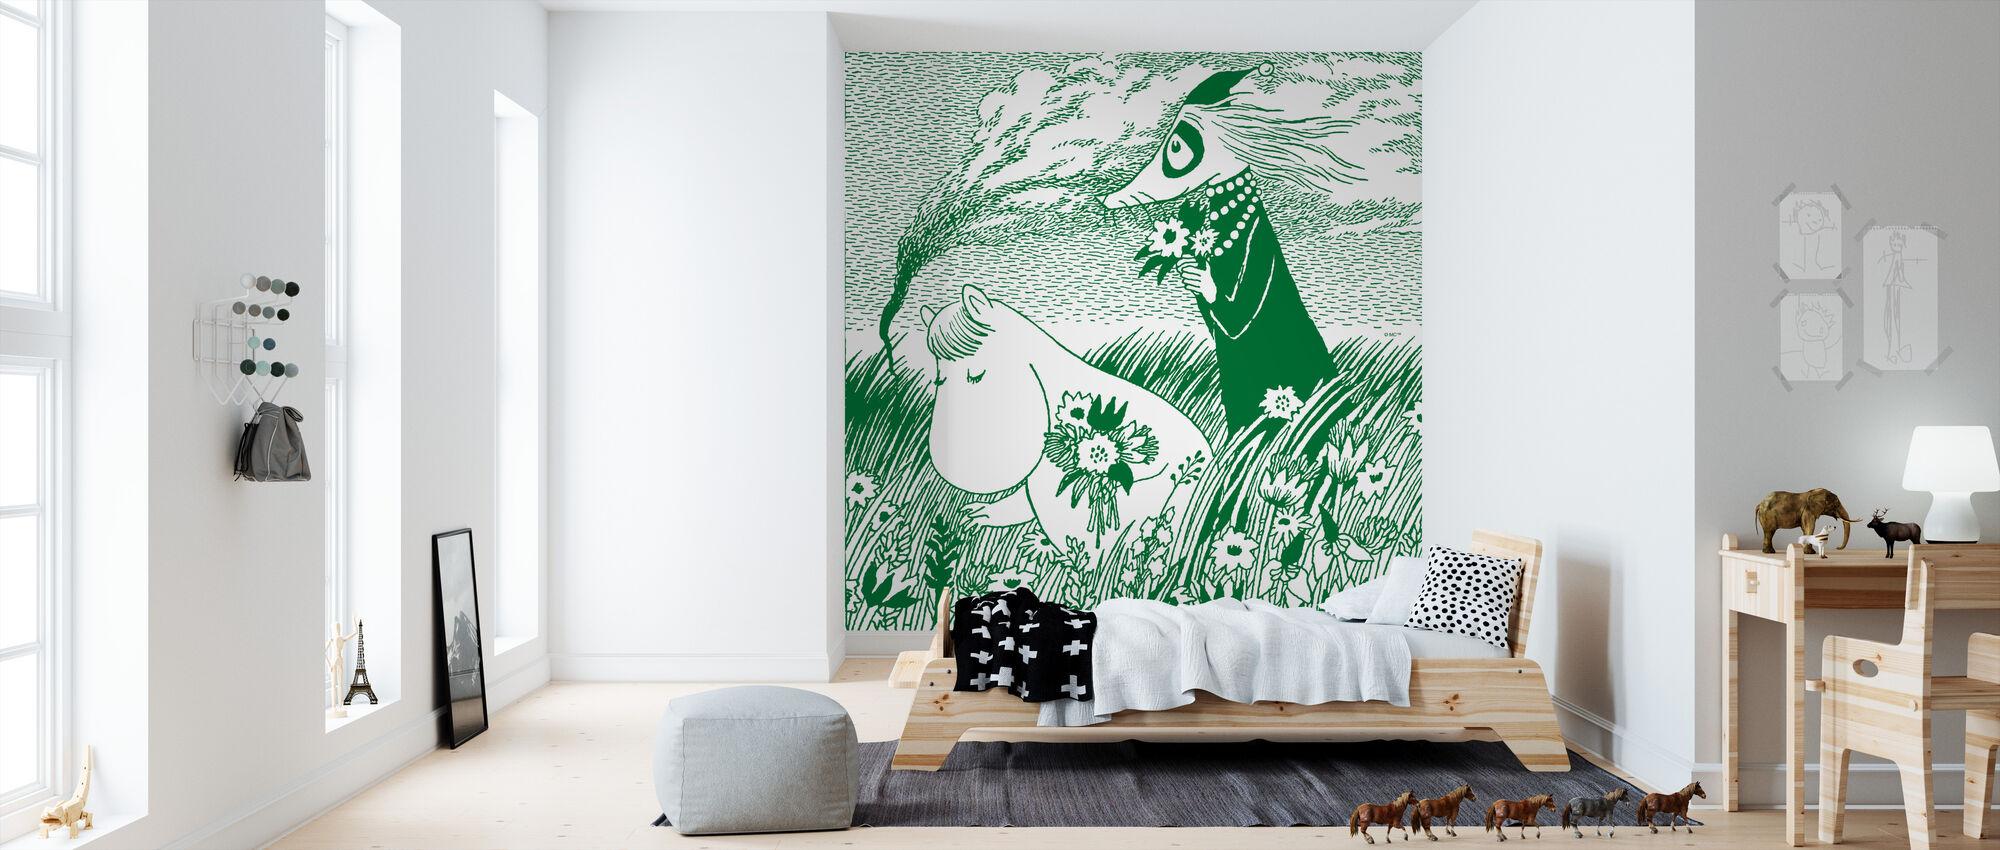 Moomin - Meadow Green - Wallpaper - Kids Room